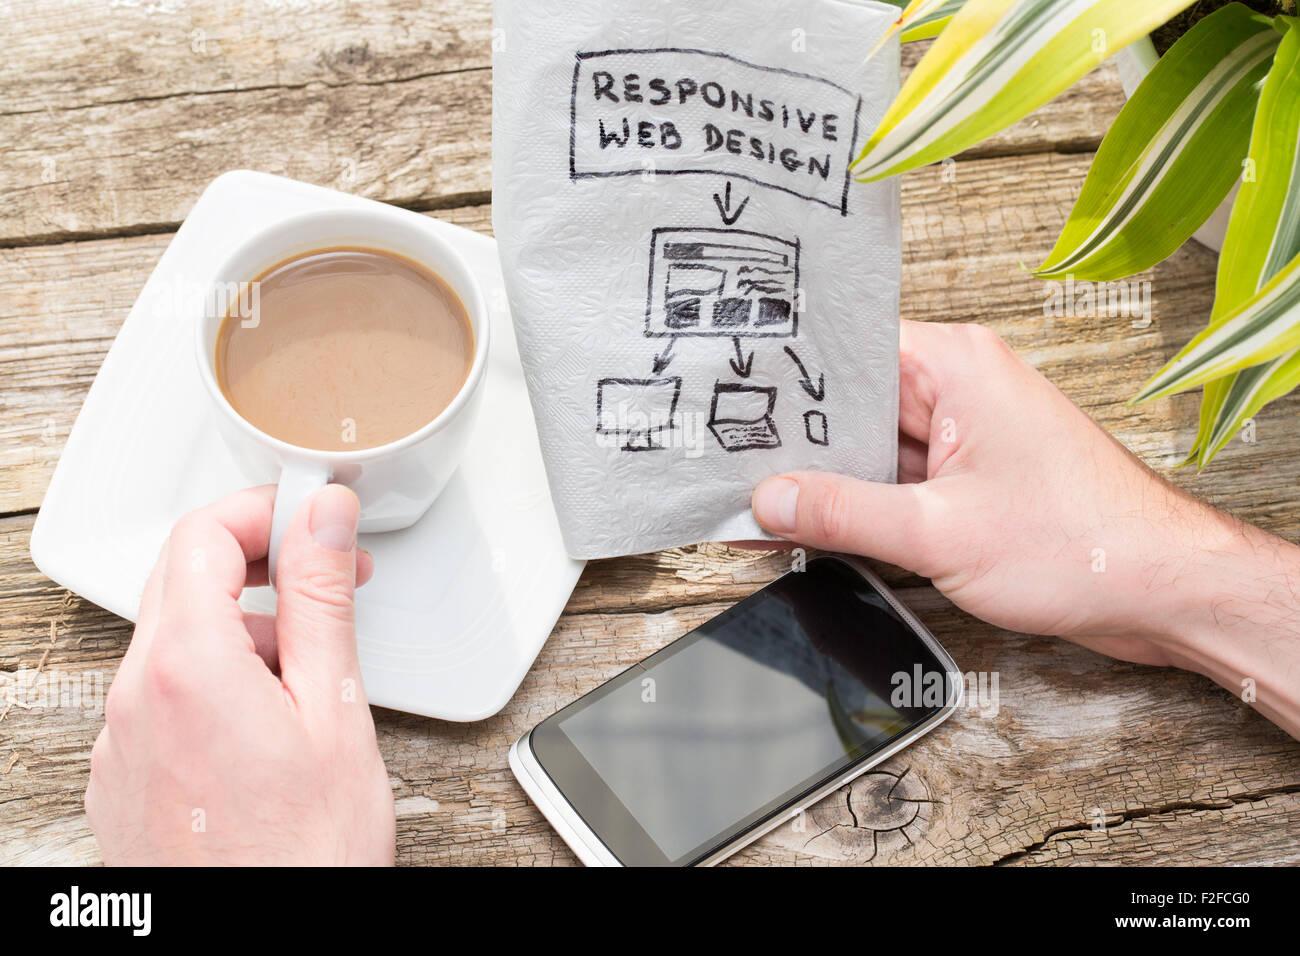 Web designer holding a blueprint of a new mobile application stock web designer holding a blueprint of a new mobile application responsive web design concept malvernweather Choice Image